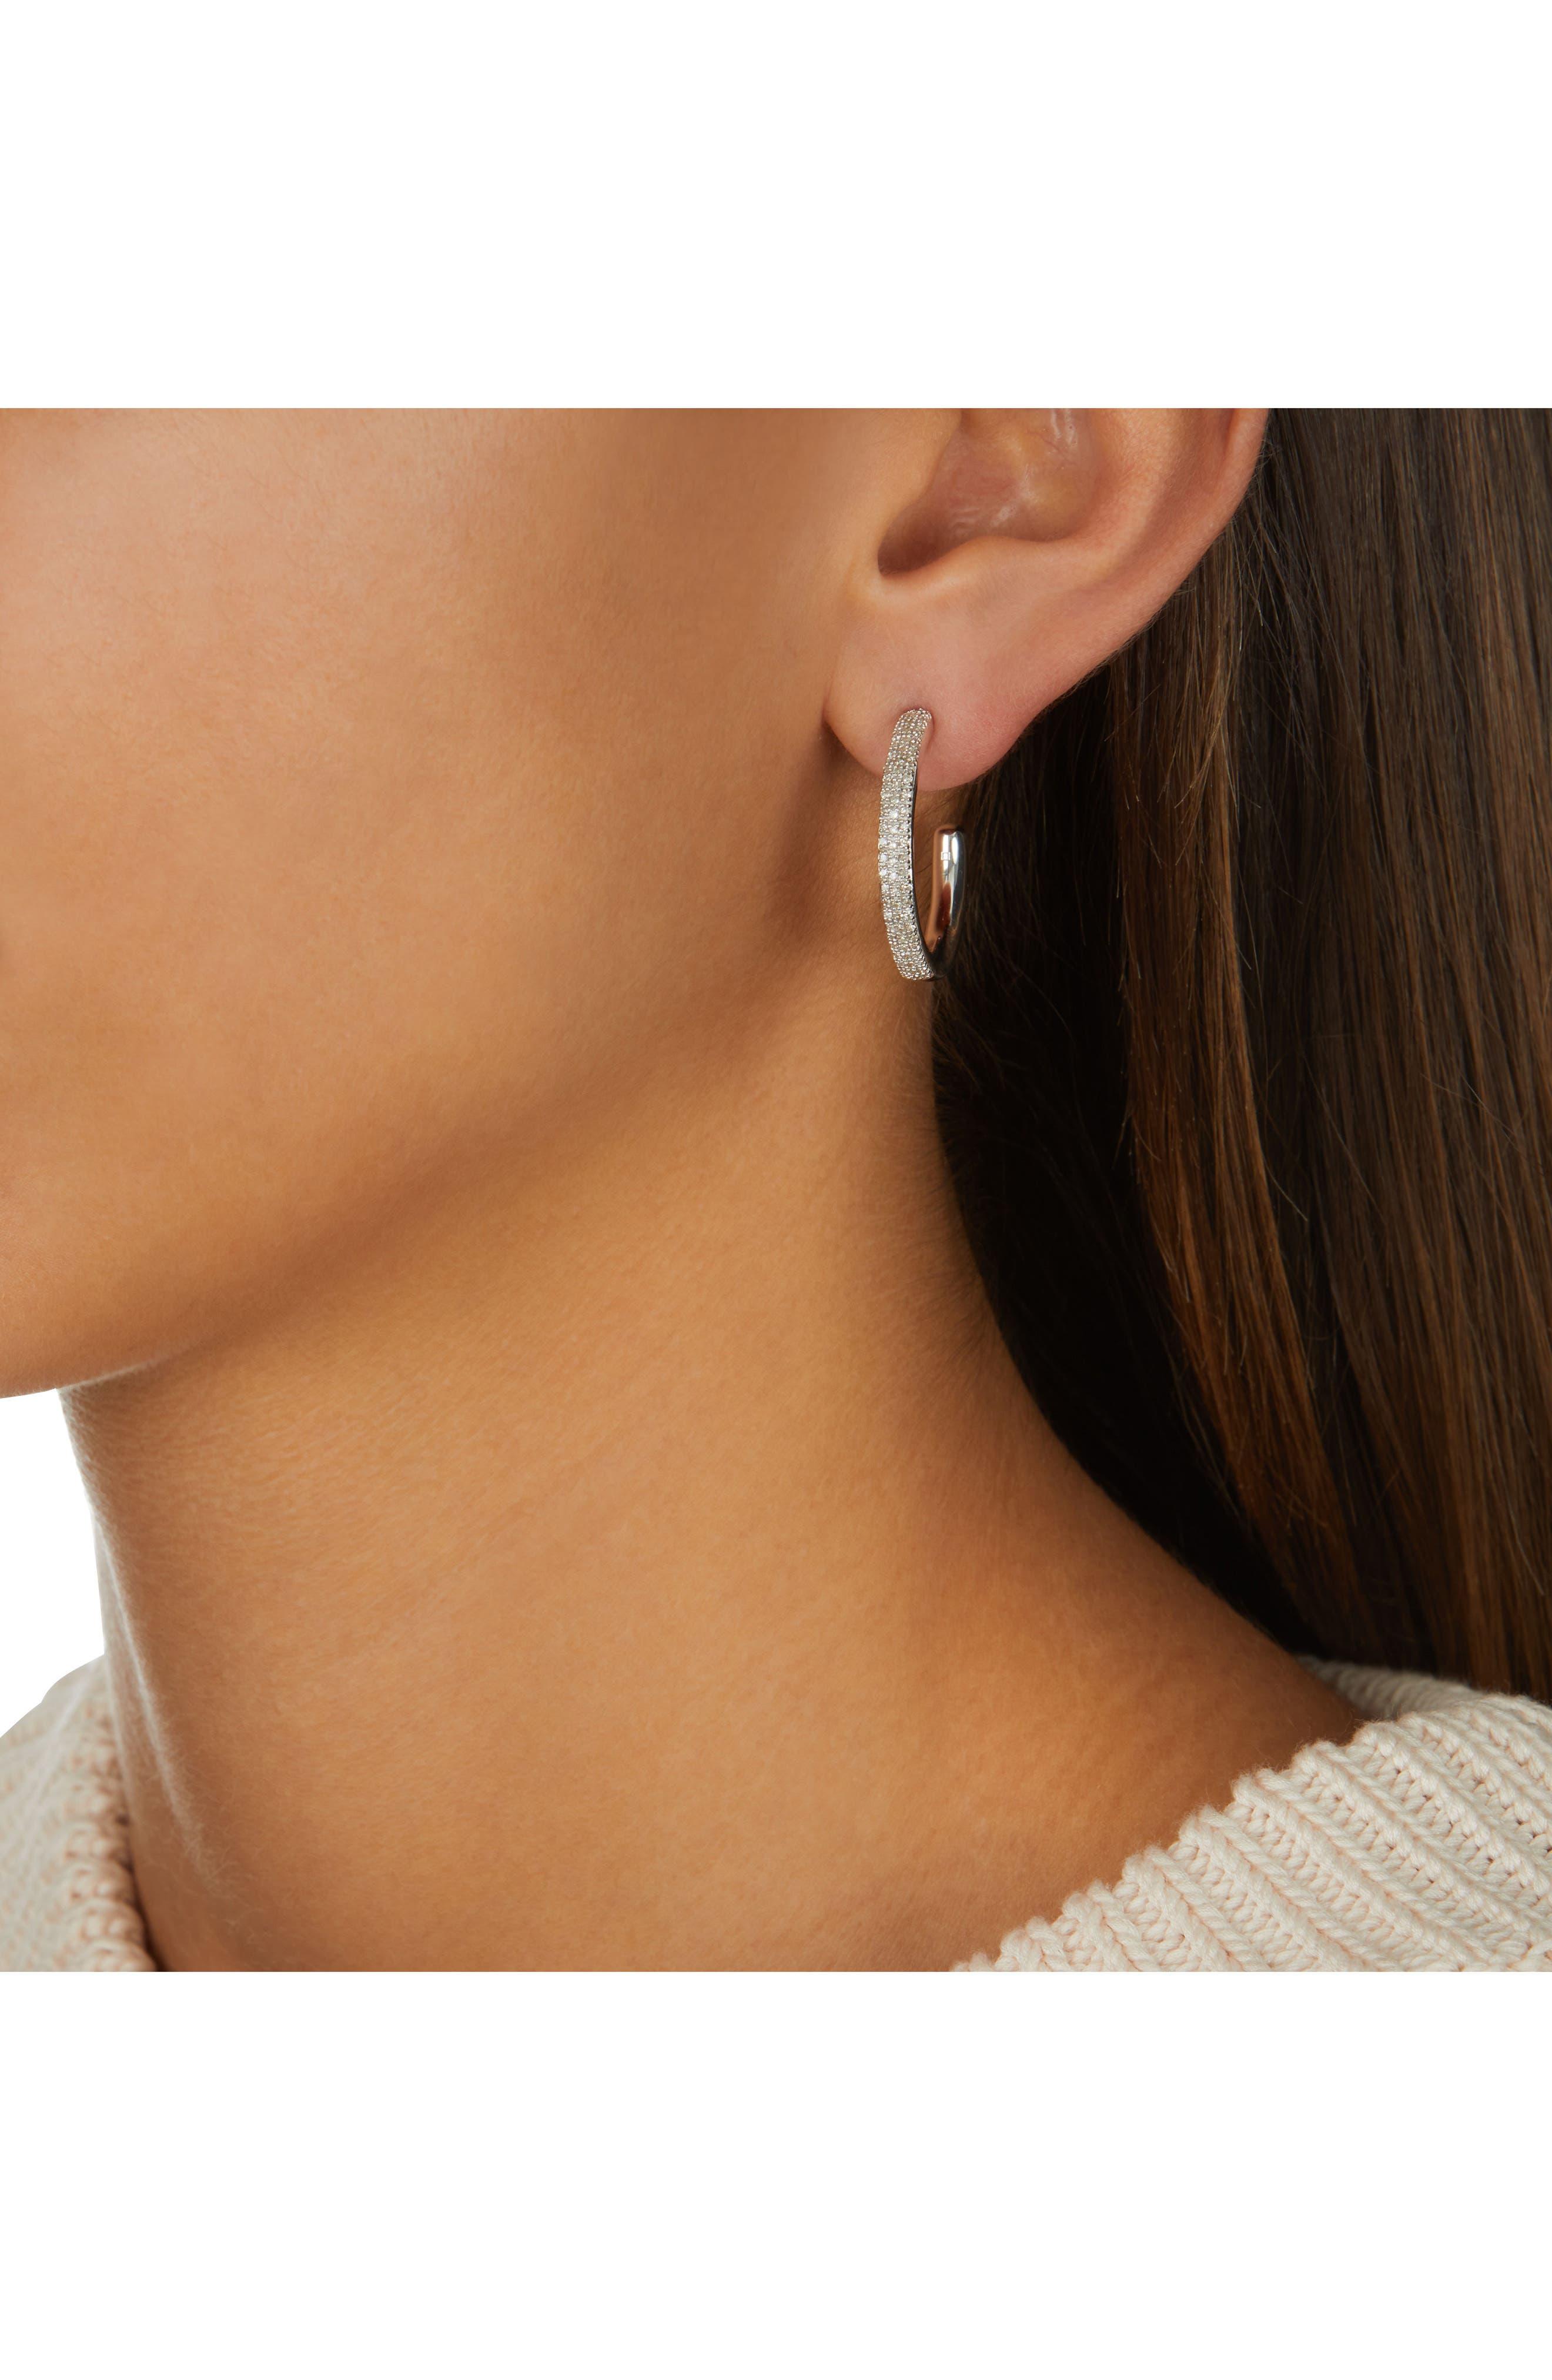 Fiji Large Diamond Hoop Earrings,                             Alternate thumbnail 2, color,                             SILVER